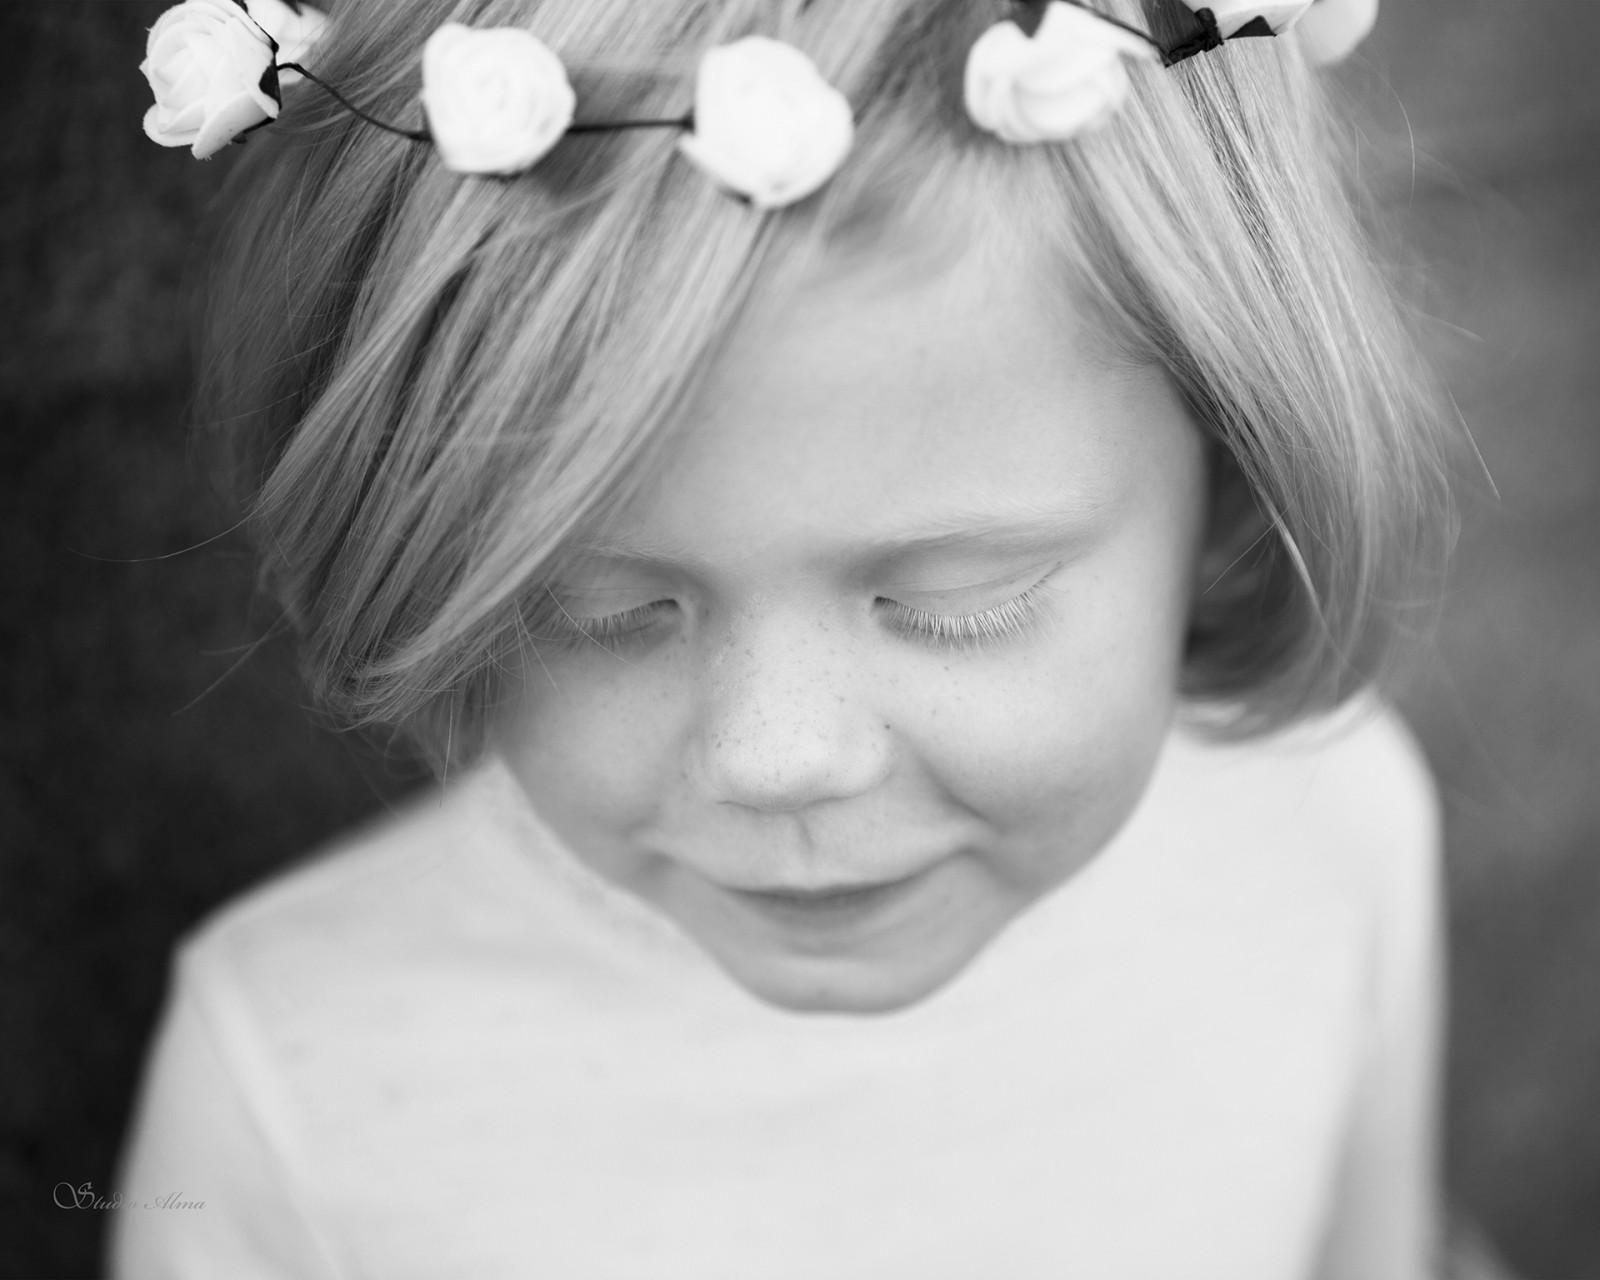 barn-portrett-studioalma-jente